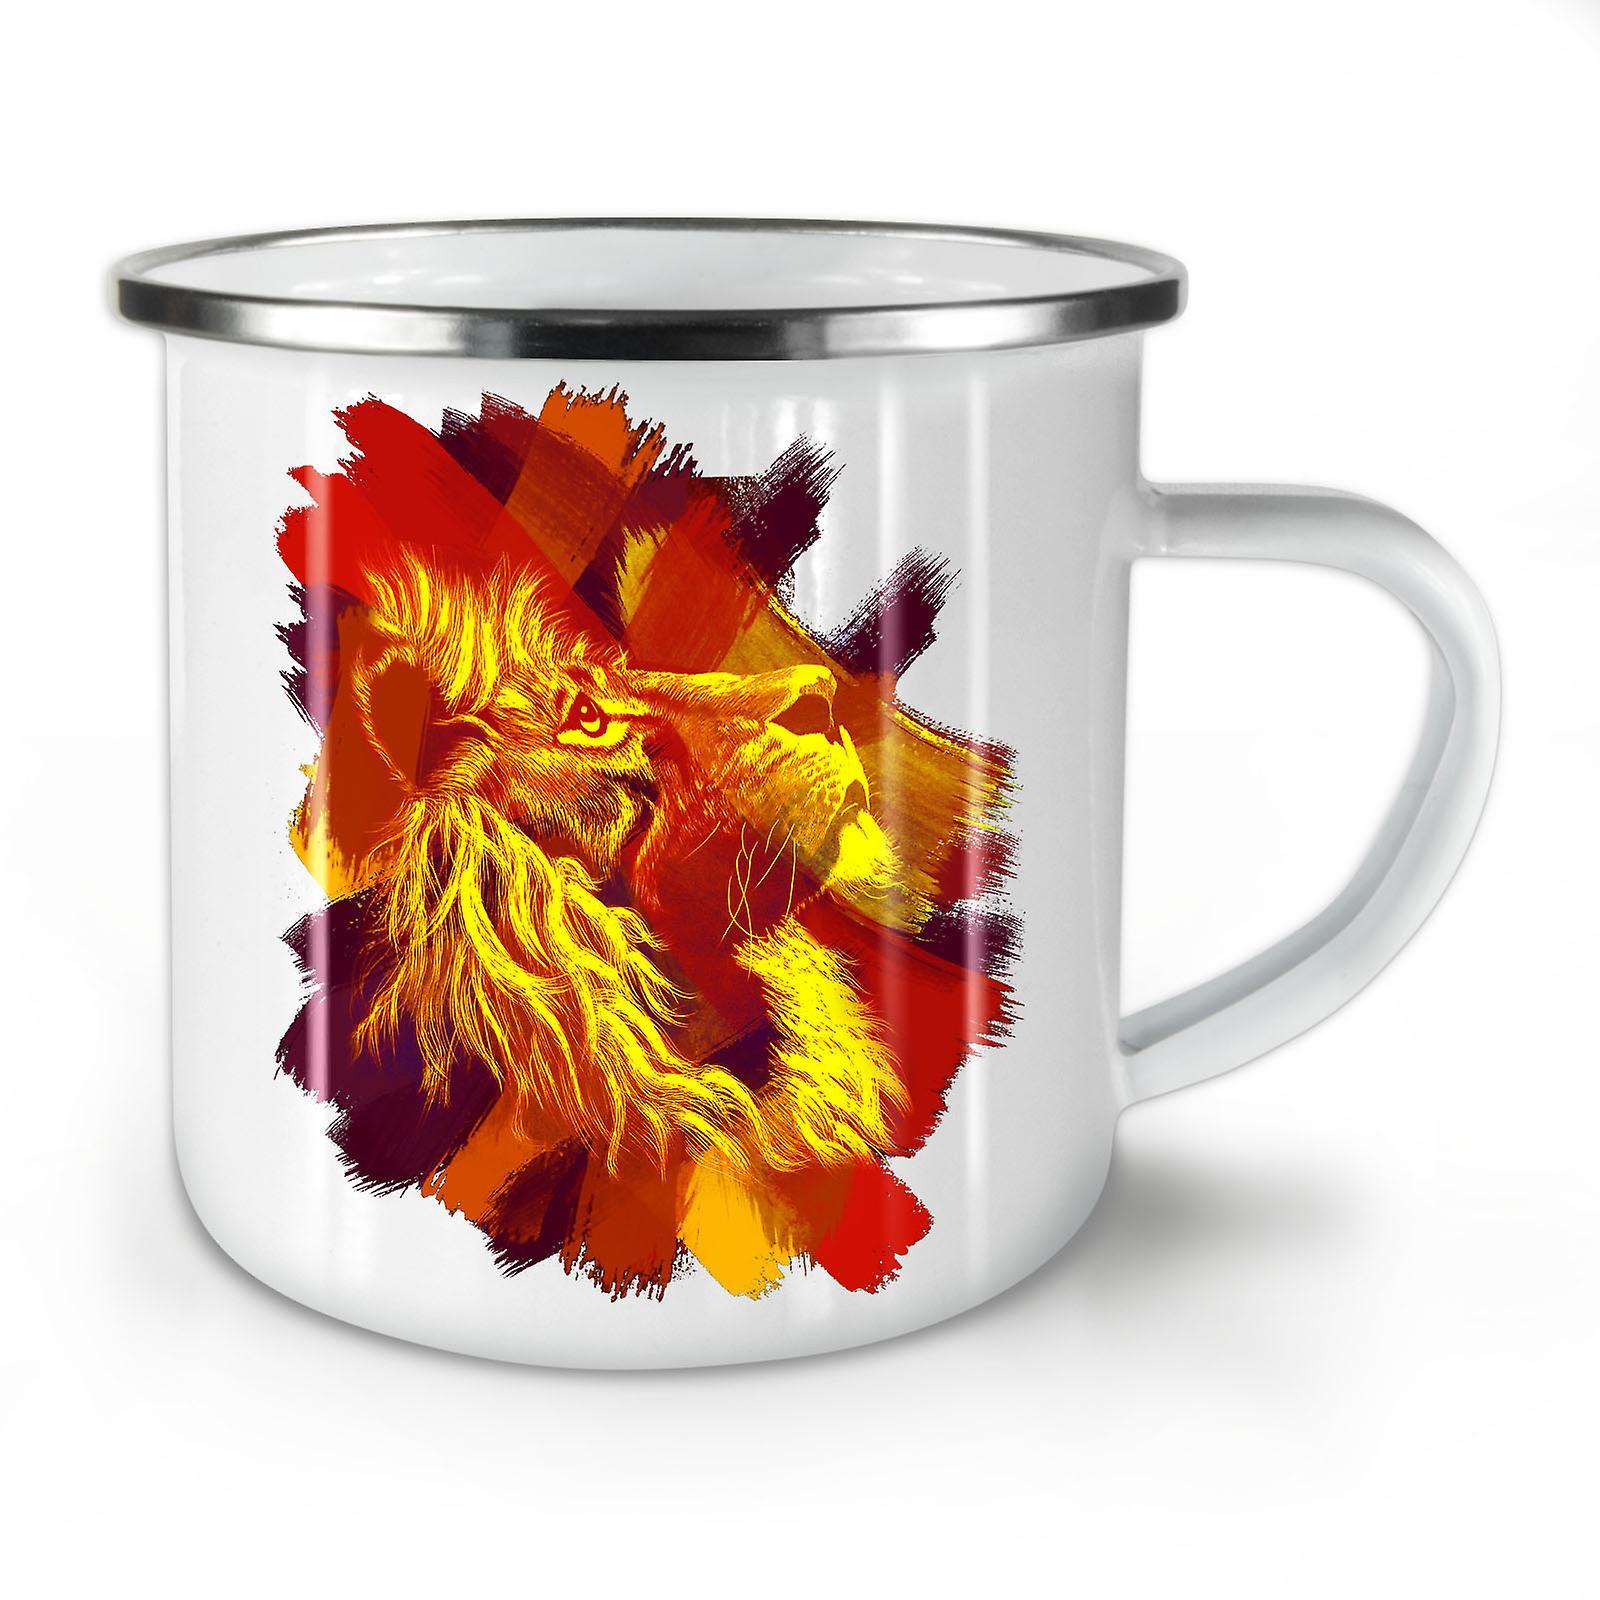 Émail Café Nouvelle Lion OzWellcoda Teinte Magnific Whitetea Mug10 IYgbfy6v7